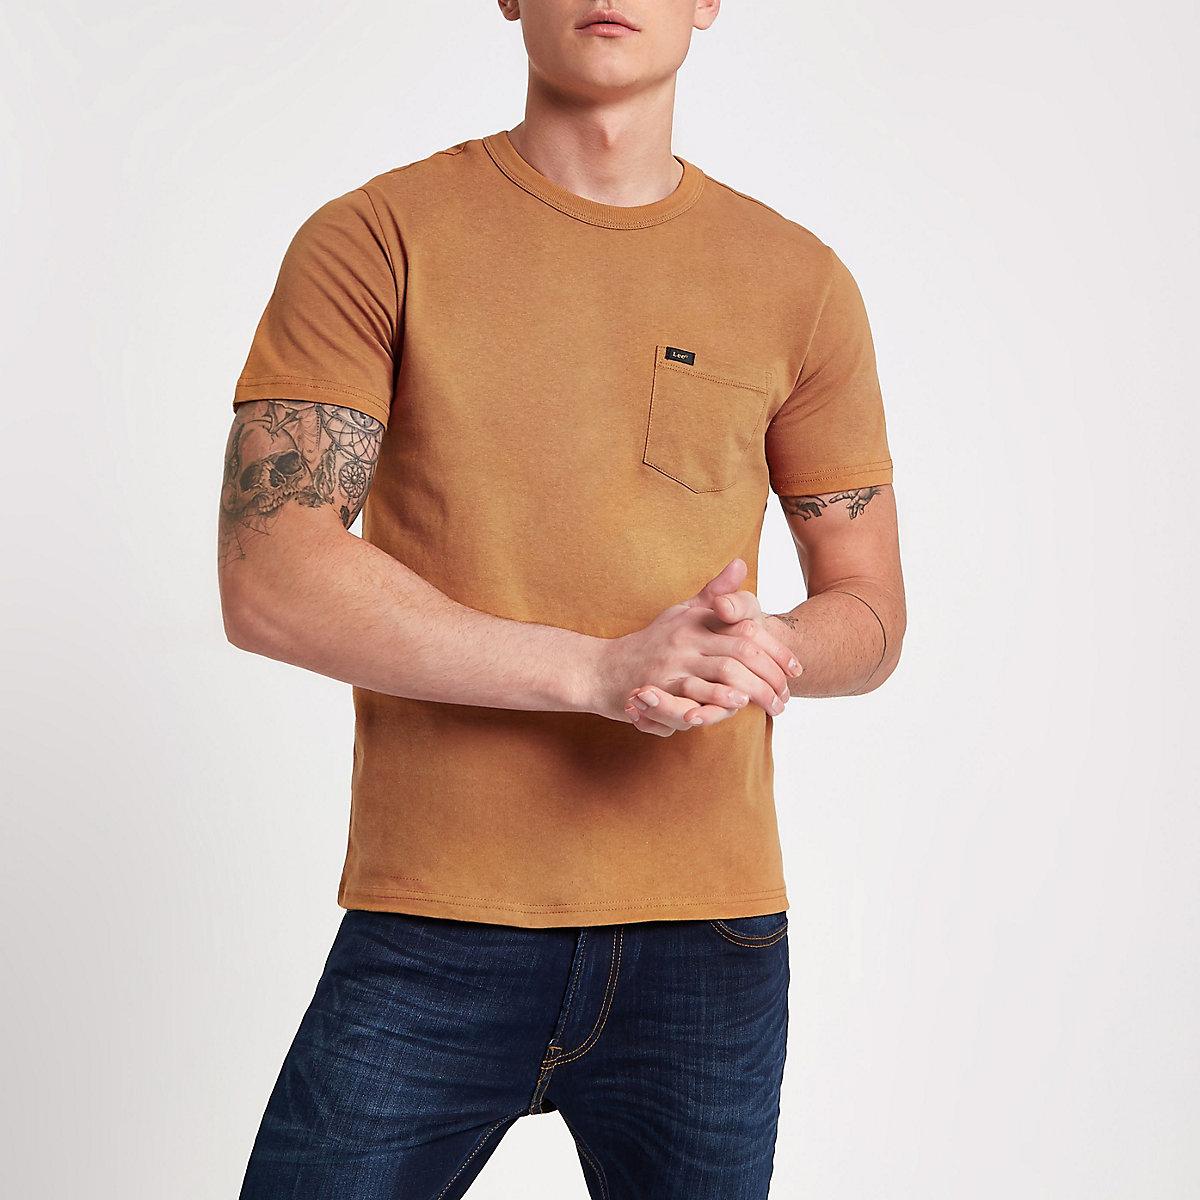 Lee tan crew neck pocket T-shirt